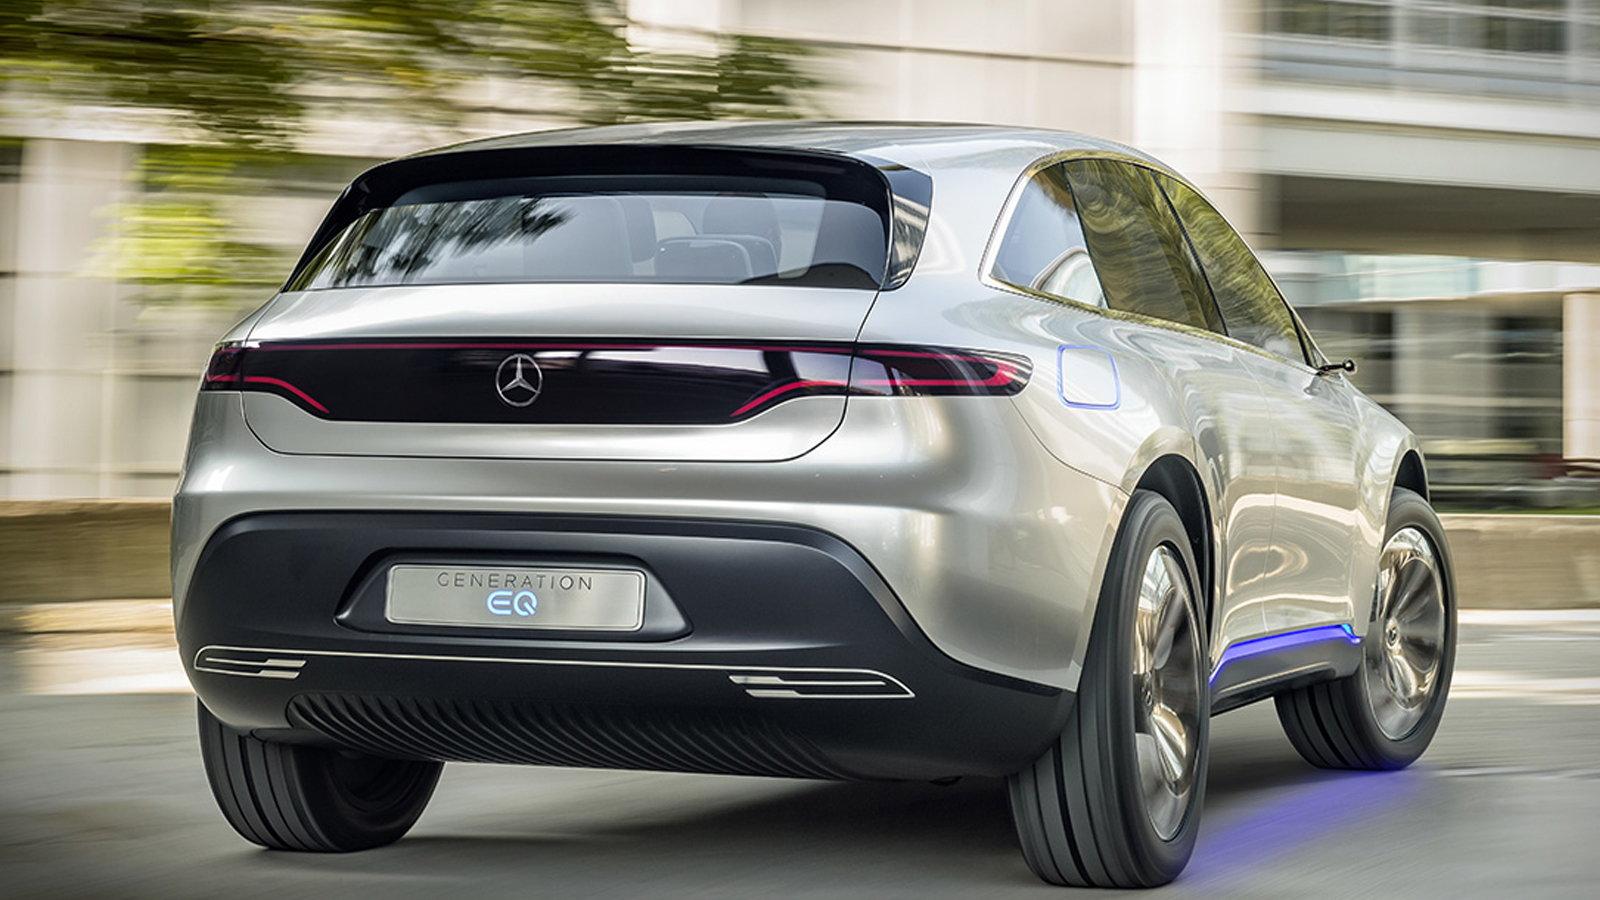 The Electric Mercedes-Benz EQC